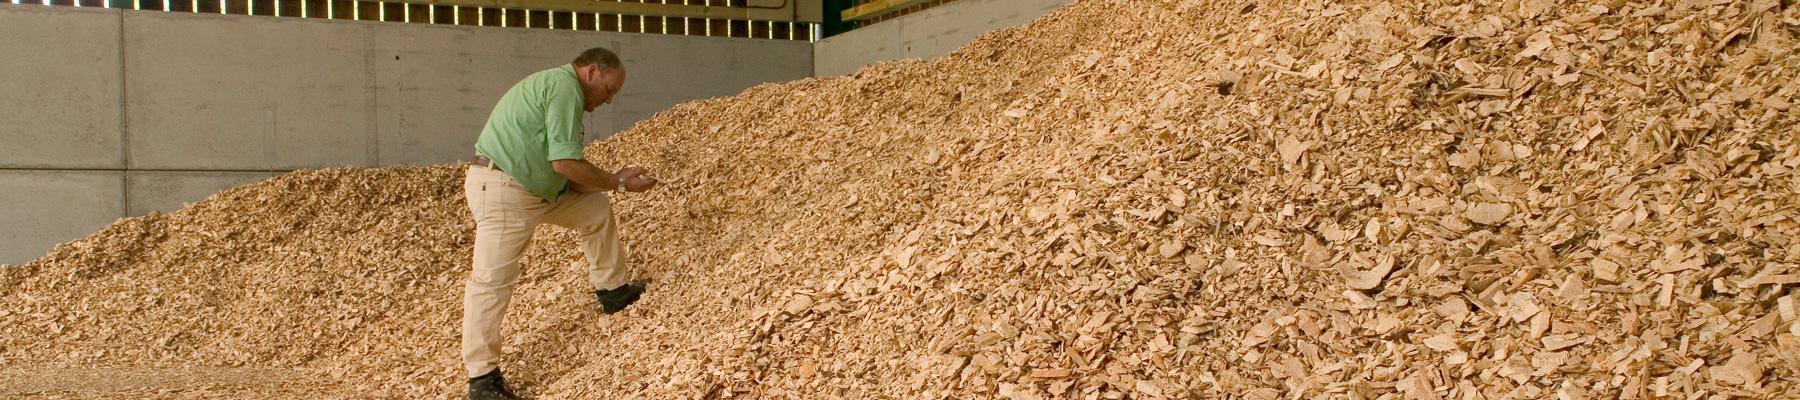 Why-choose-biomass heat10